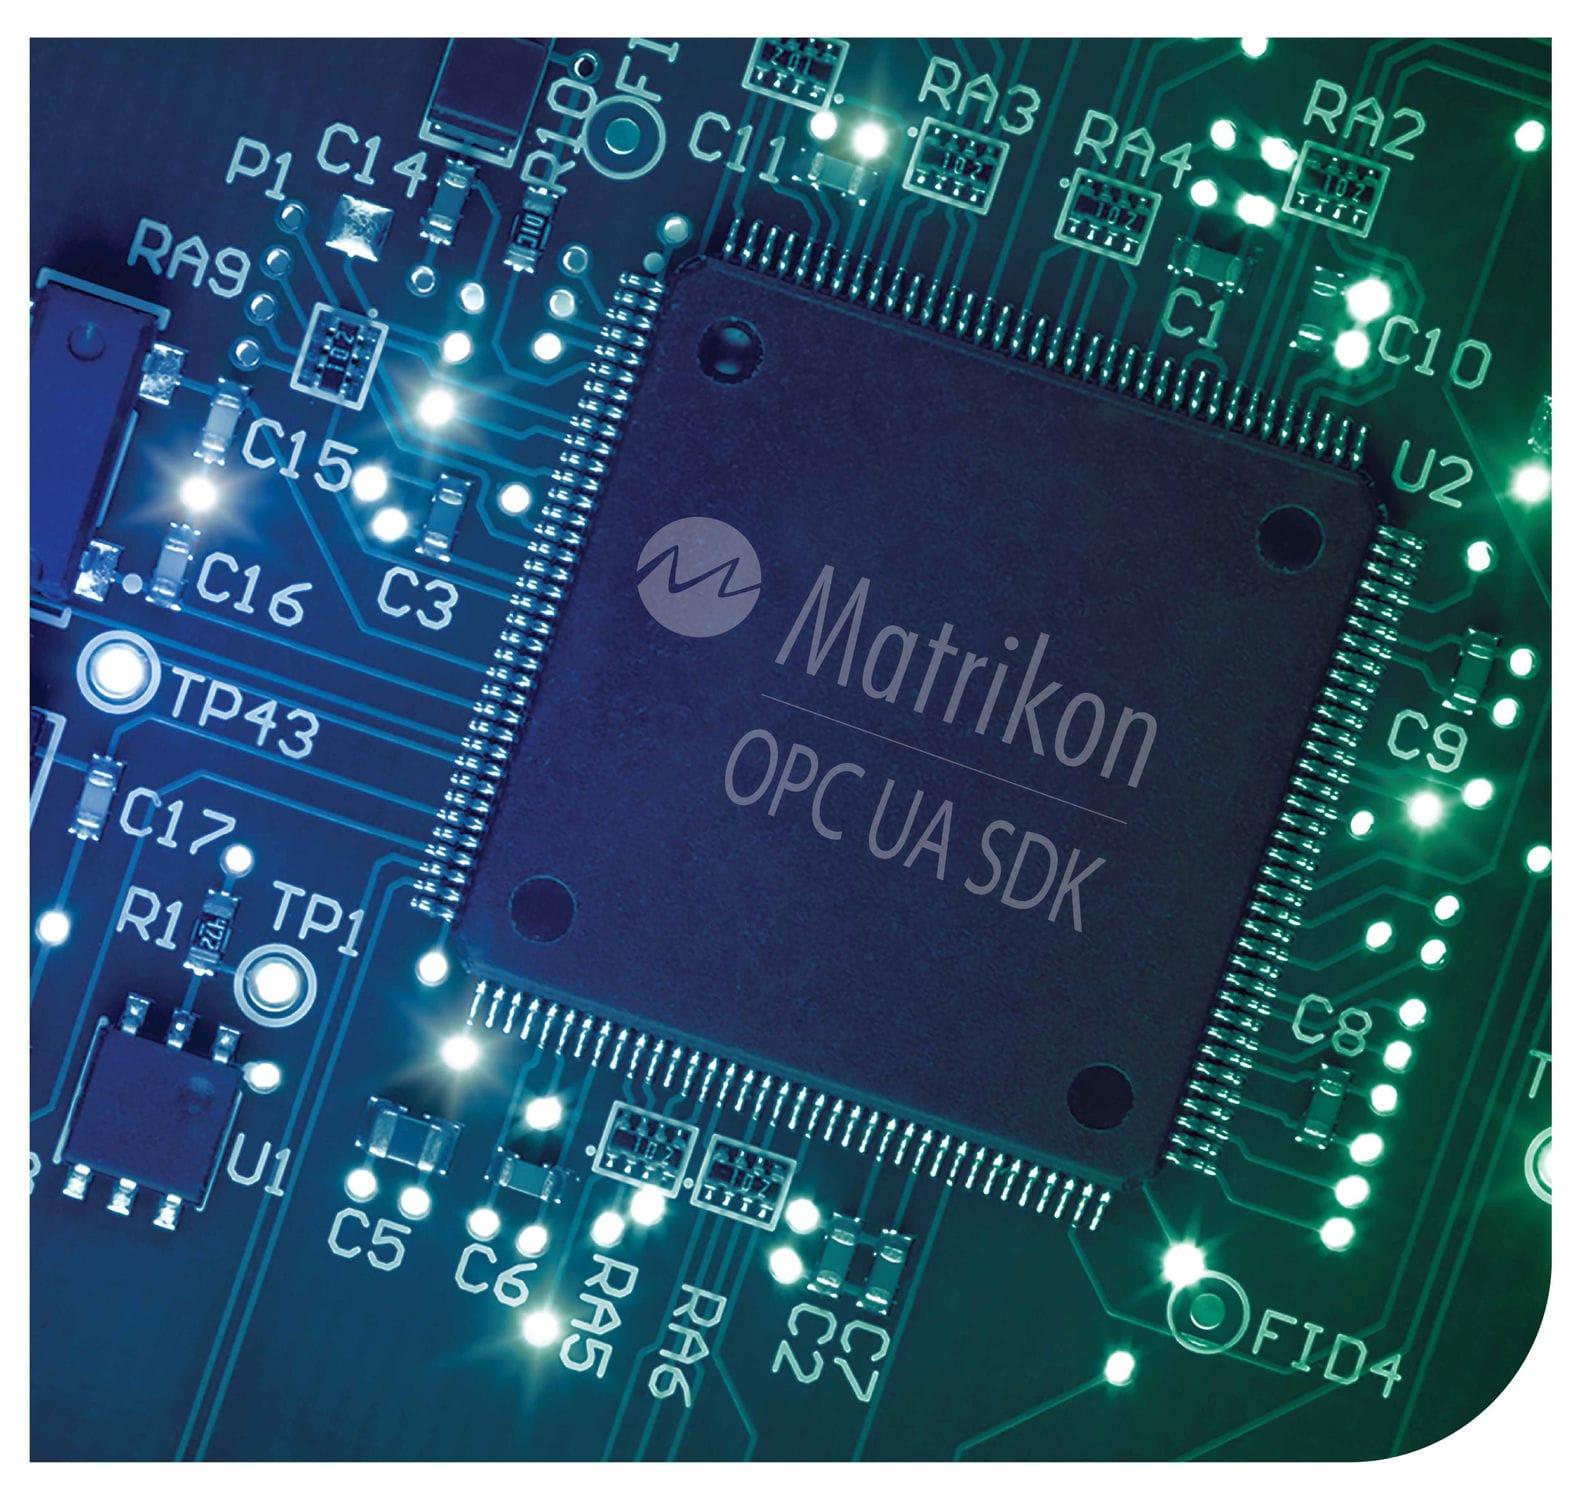 Toolkit OPC - R400 - Matrikon OPC - Vidéos